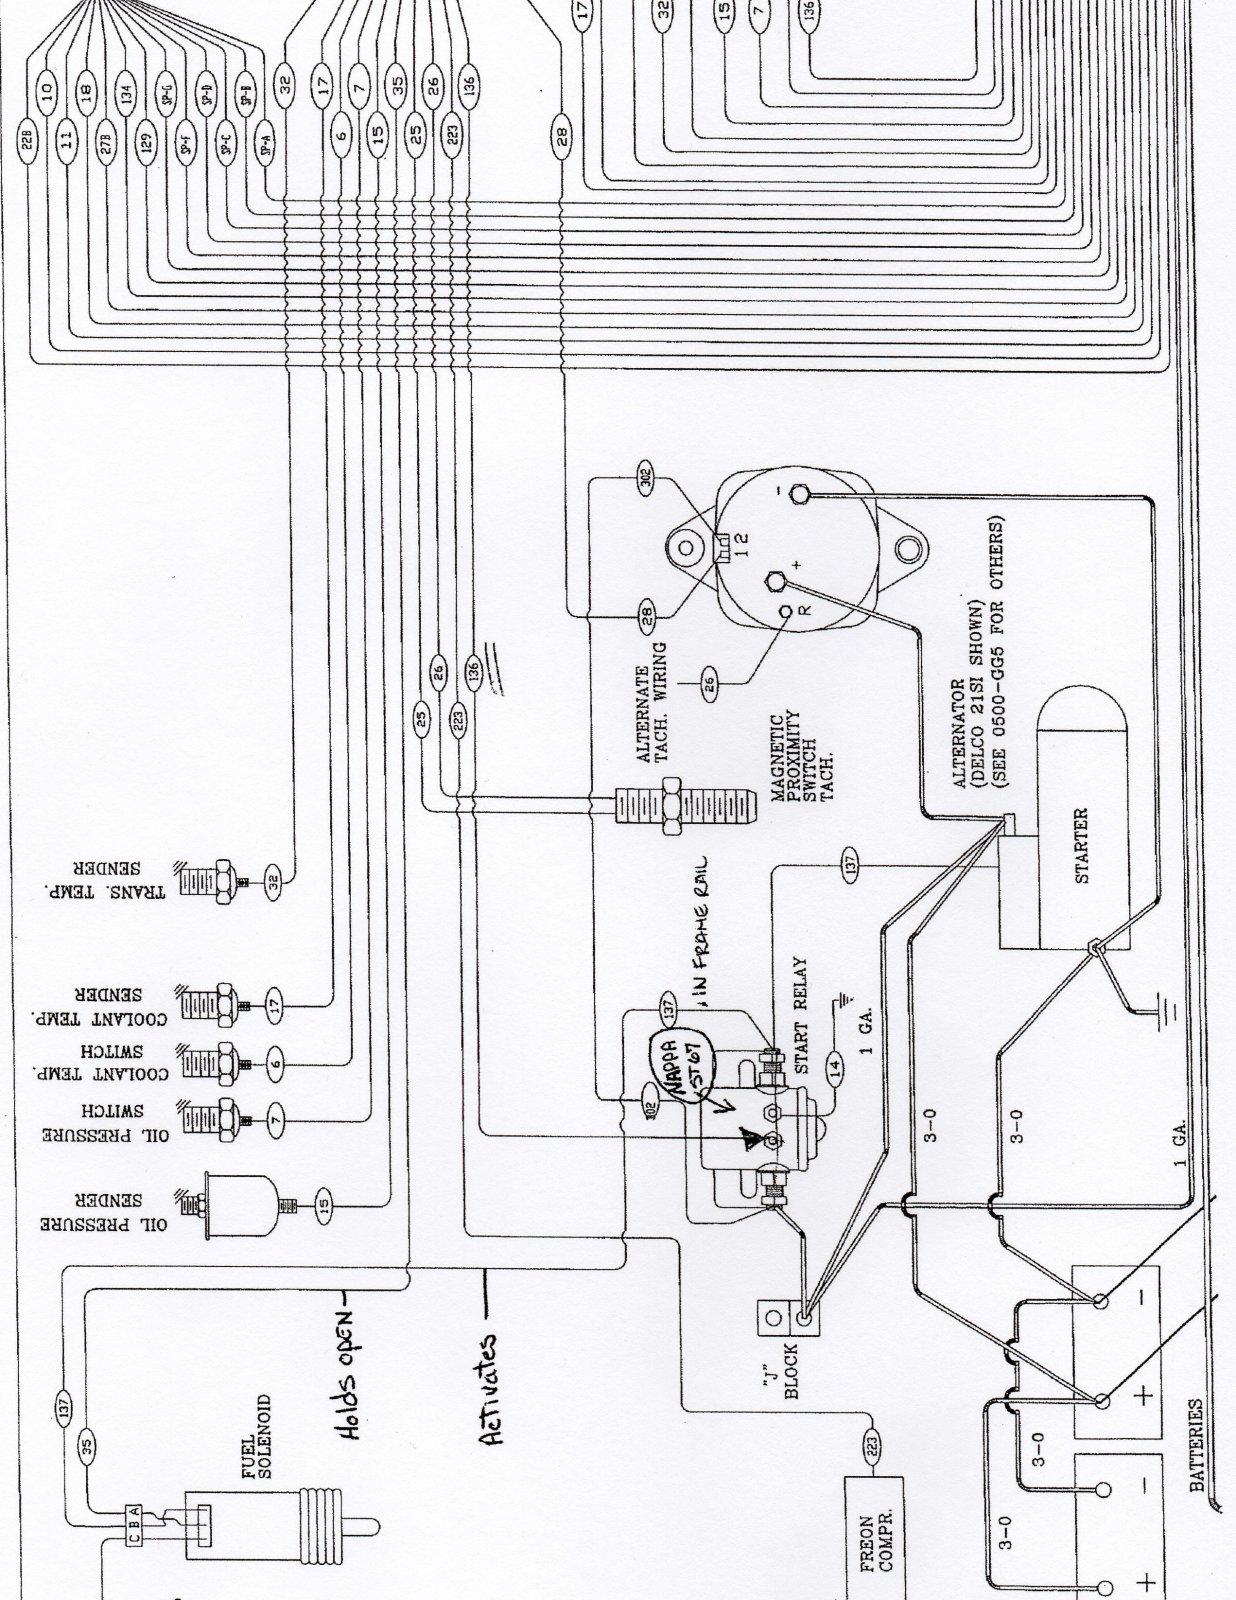 fleetwood motorhome battery wiring diagram fleetwood wiring 1988 southwind motorhome battery wiring diagram 1988 auto wiring